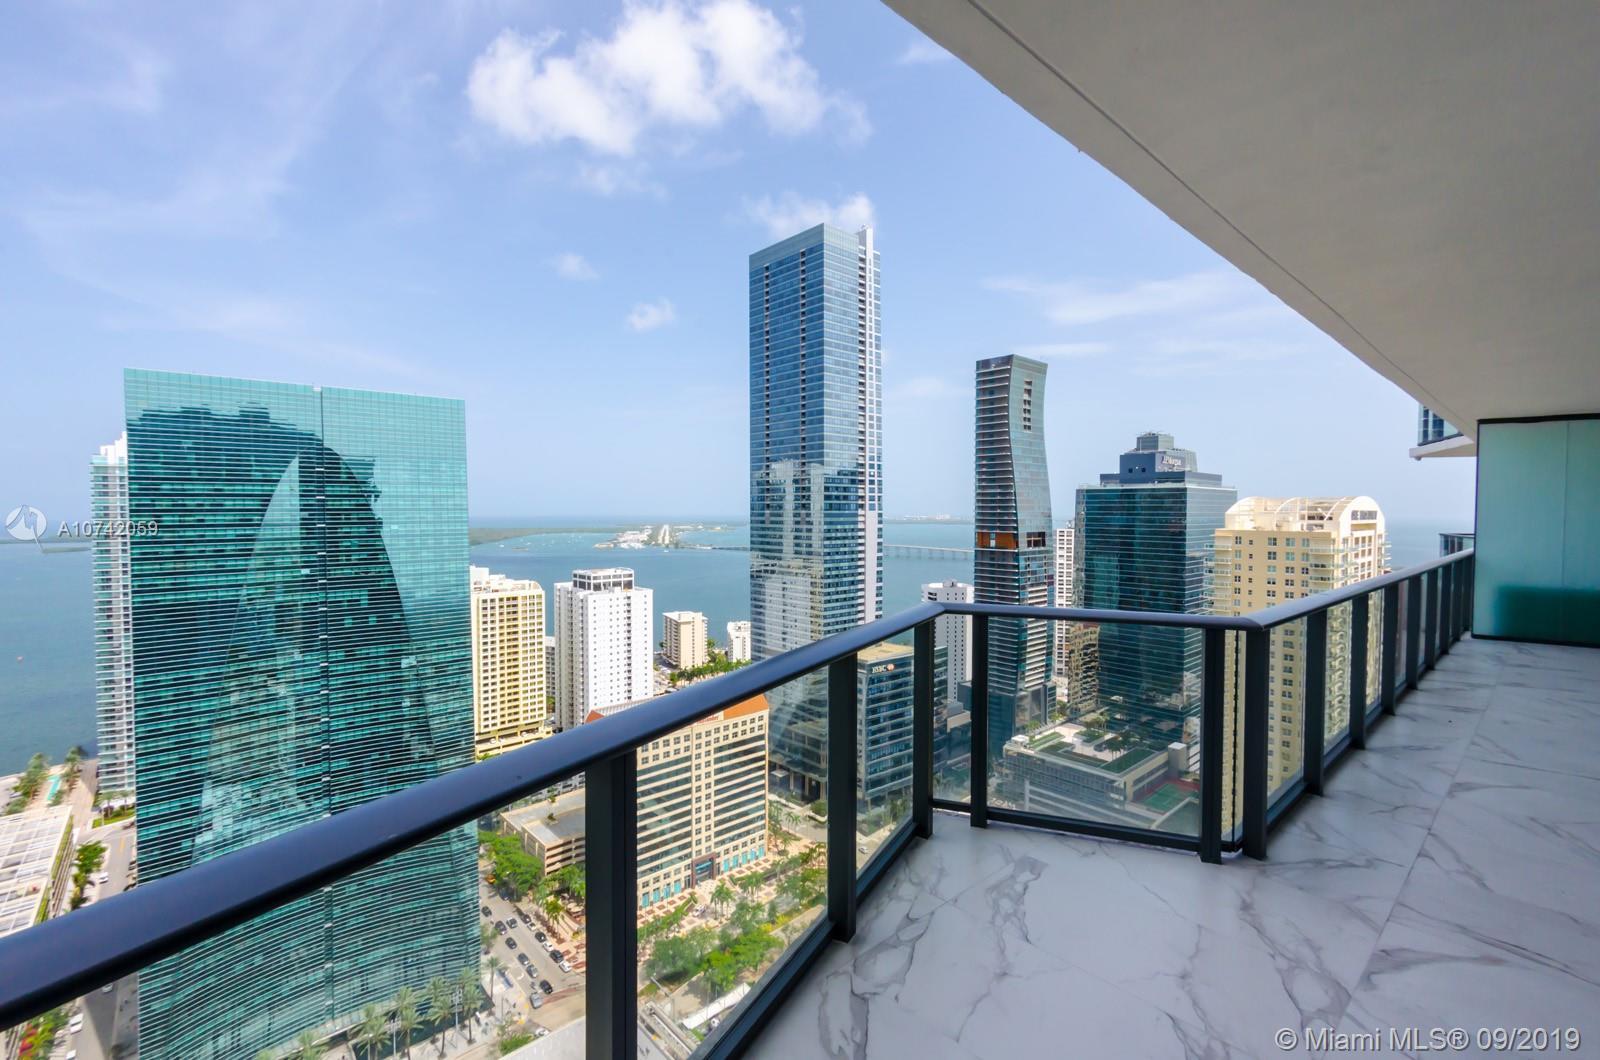 1300 S Miami Ave # 3702, Miami, Florida 33130, 2 Bedrooms Bedrooms, ,2 BathroomsBathrooms,Residential,For Sale,1300 S Miami Ave # 3702,A10742059